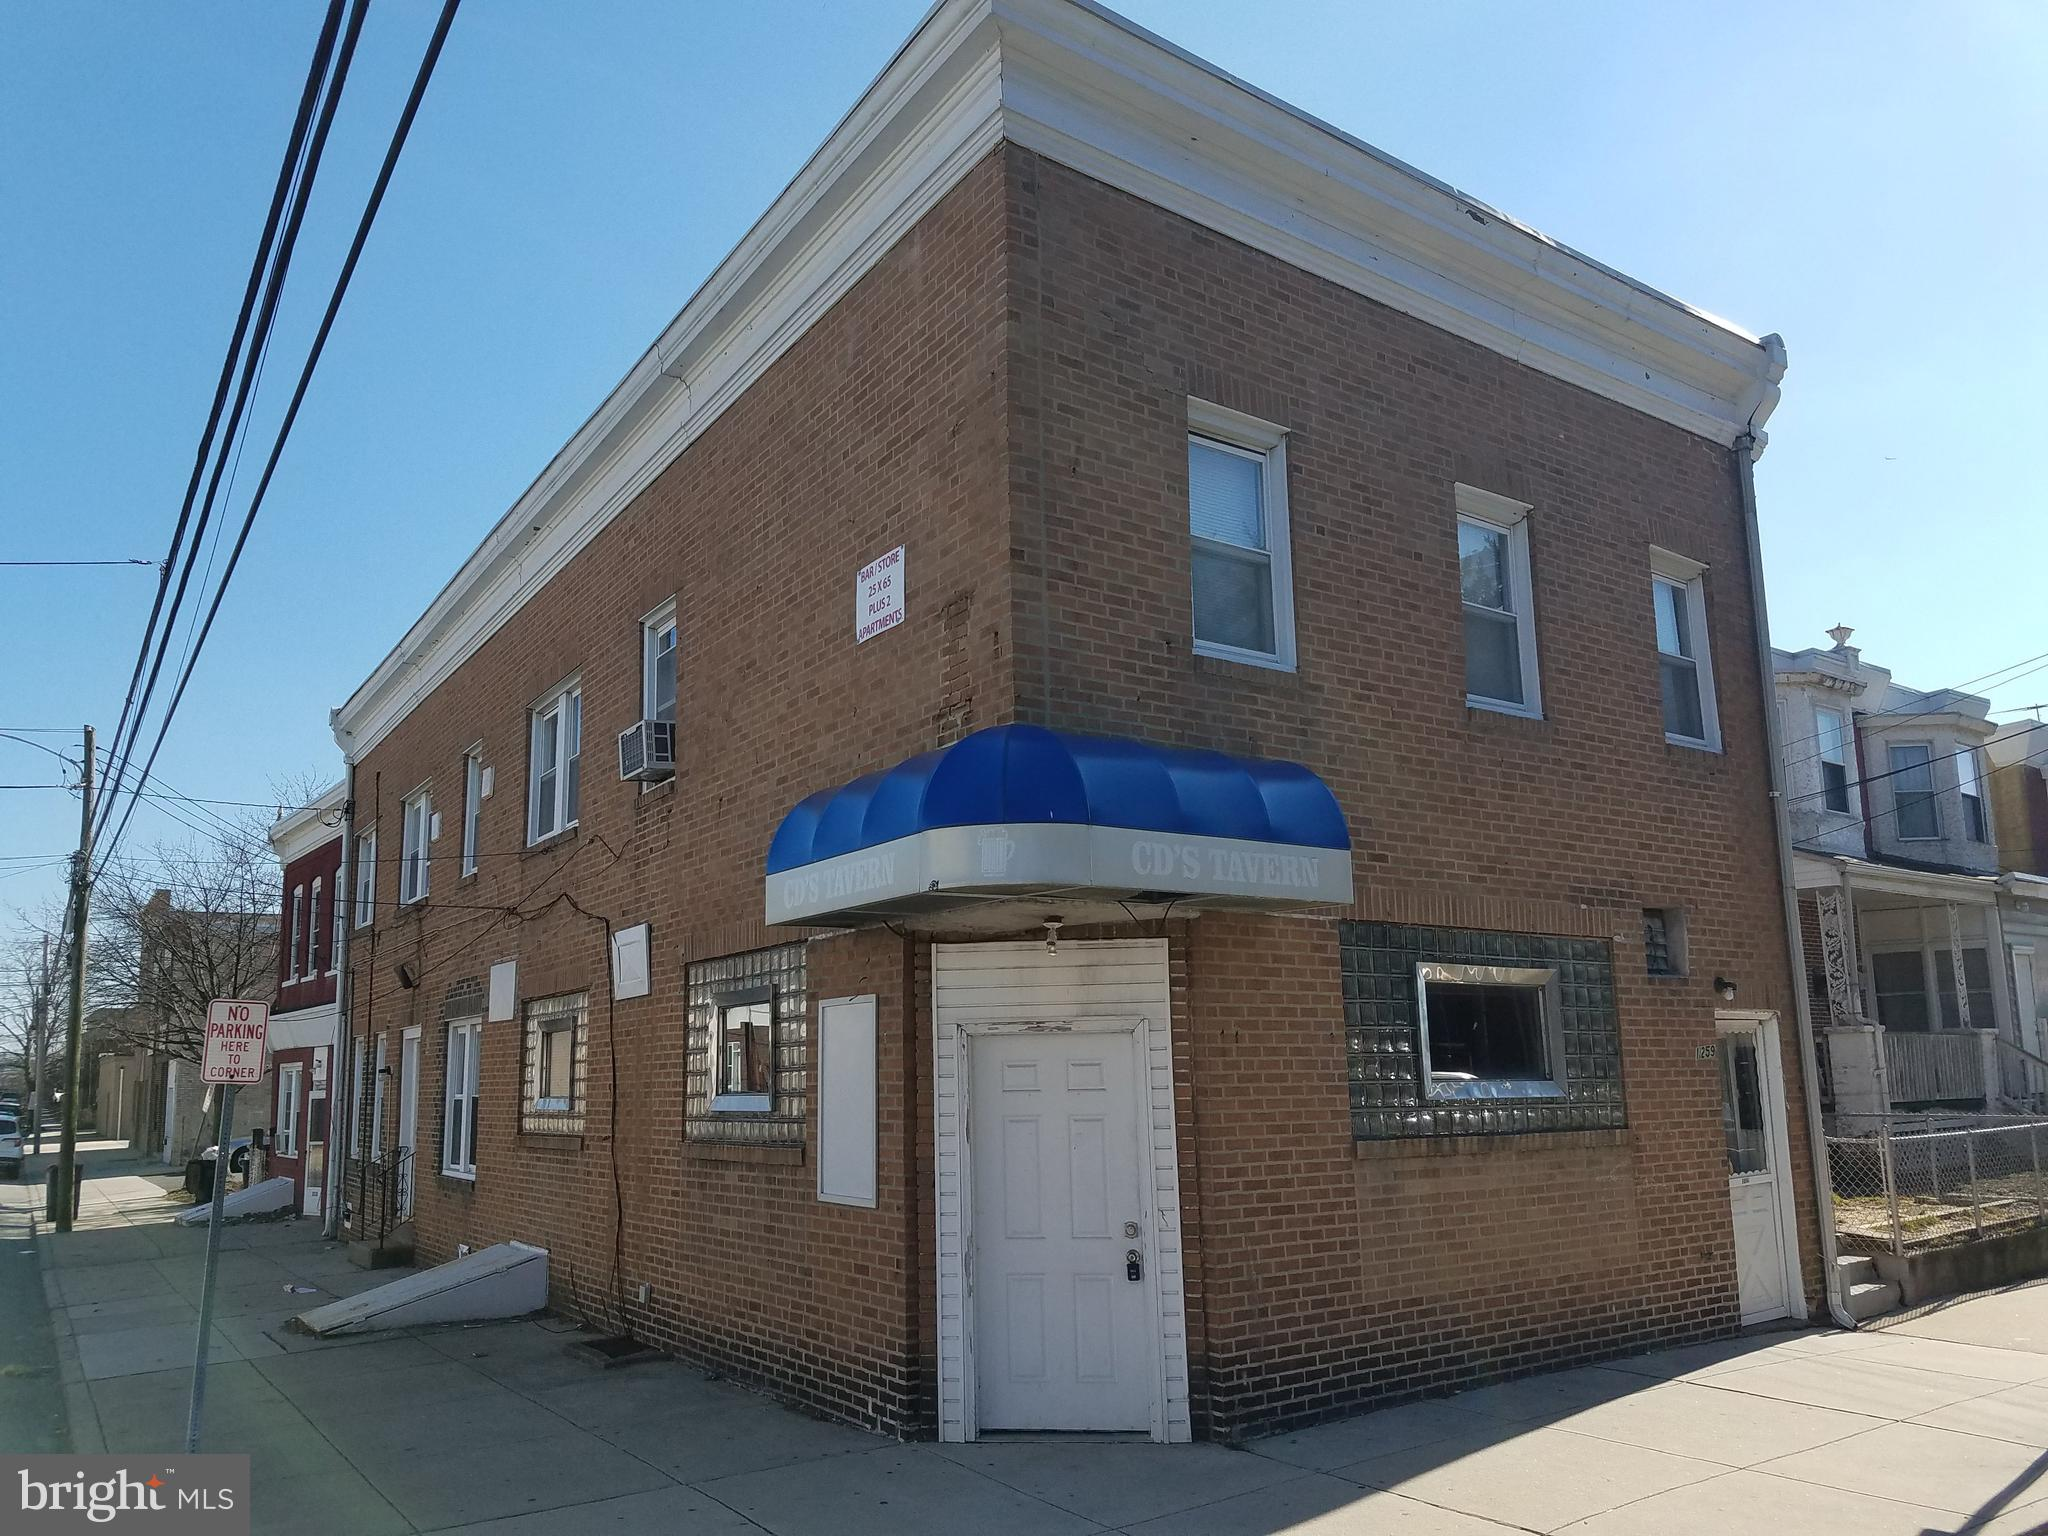 1259 E 11TH STREET, CRUM LYNNE, PA 19022